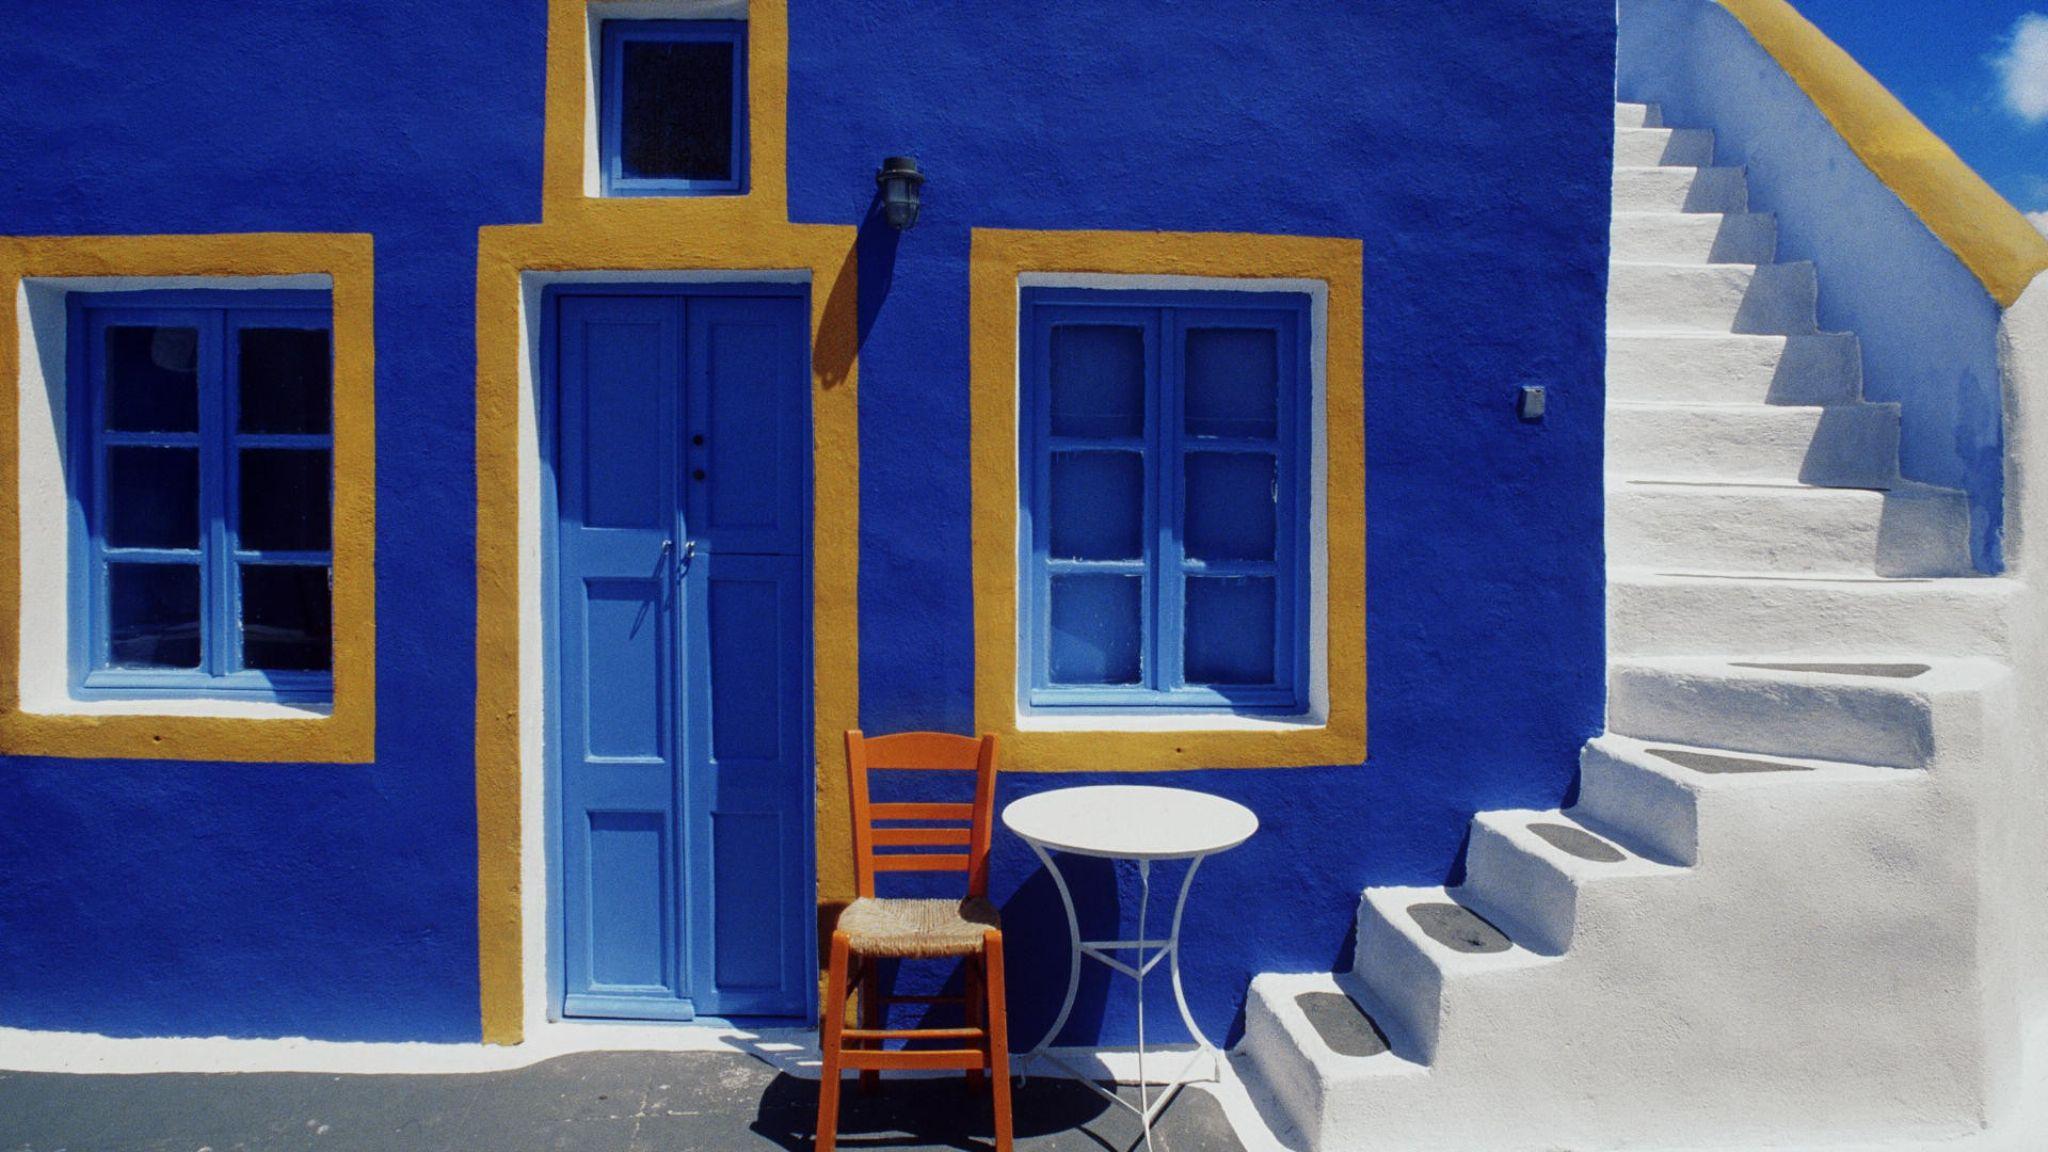 Oia, Santorini, Greece by kasiospaul